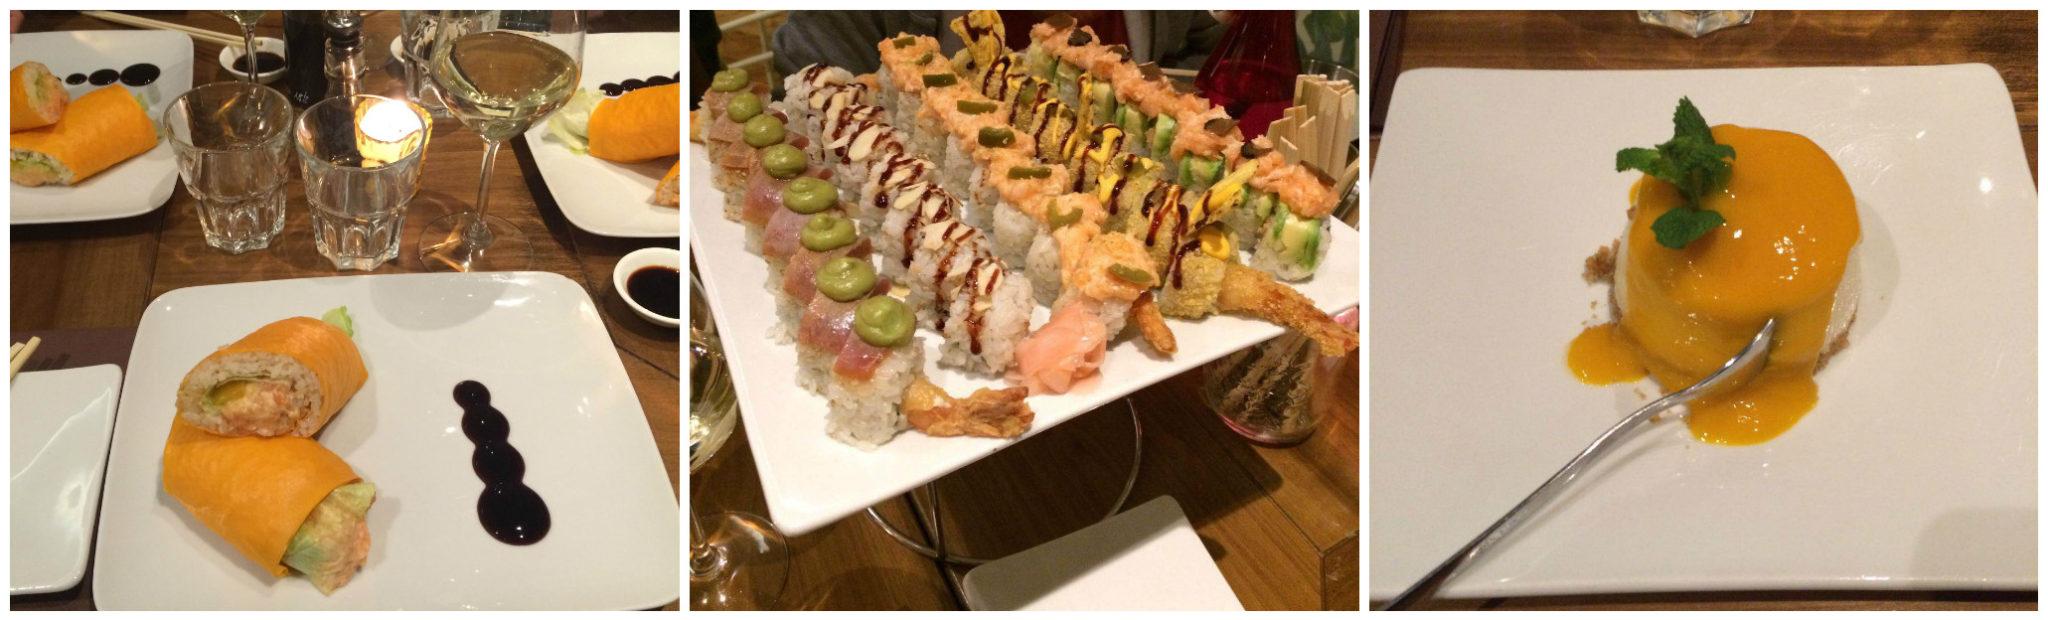 Sushi a milano 5 posti top weekend premium - Sushi porta ticinese ...